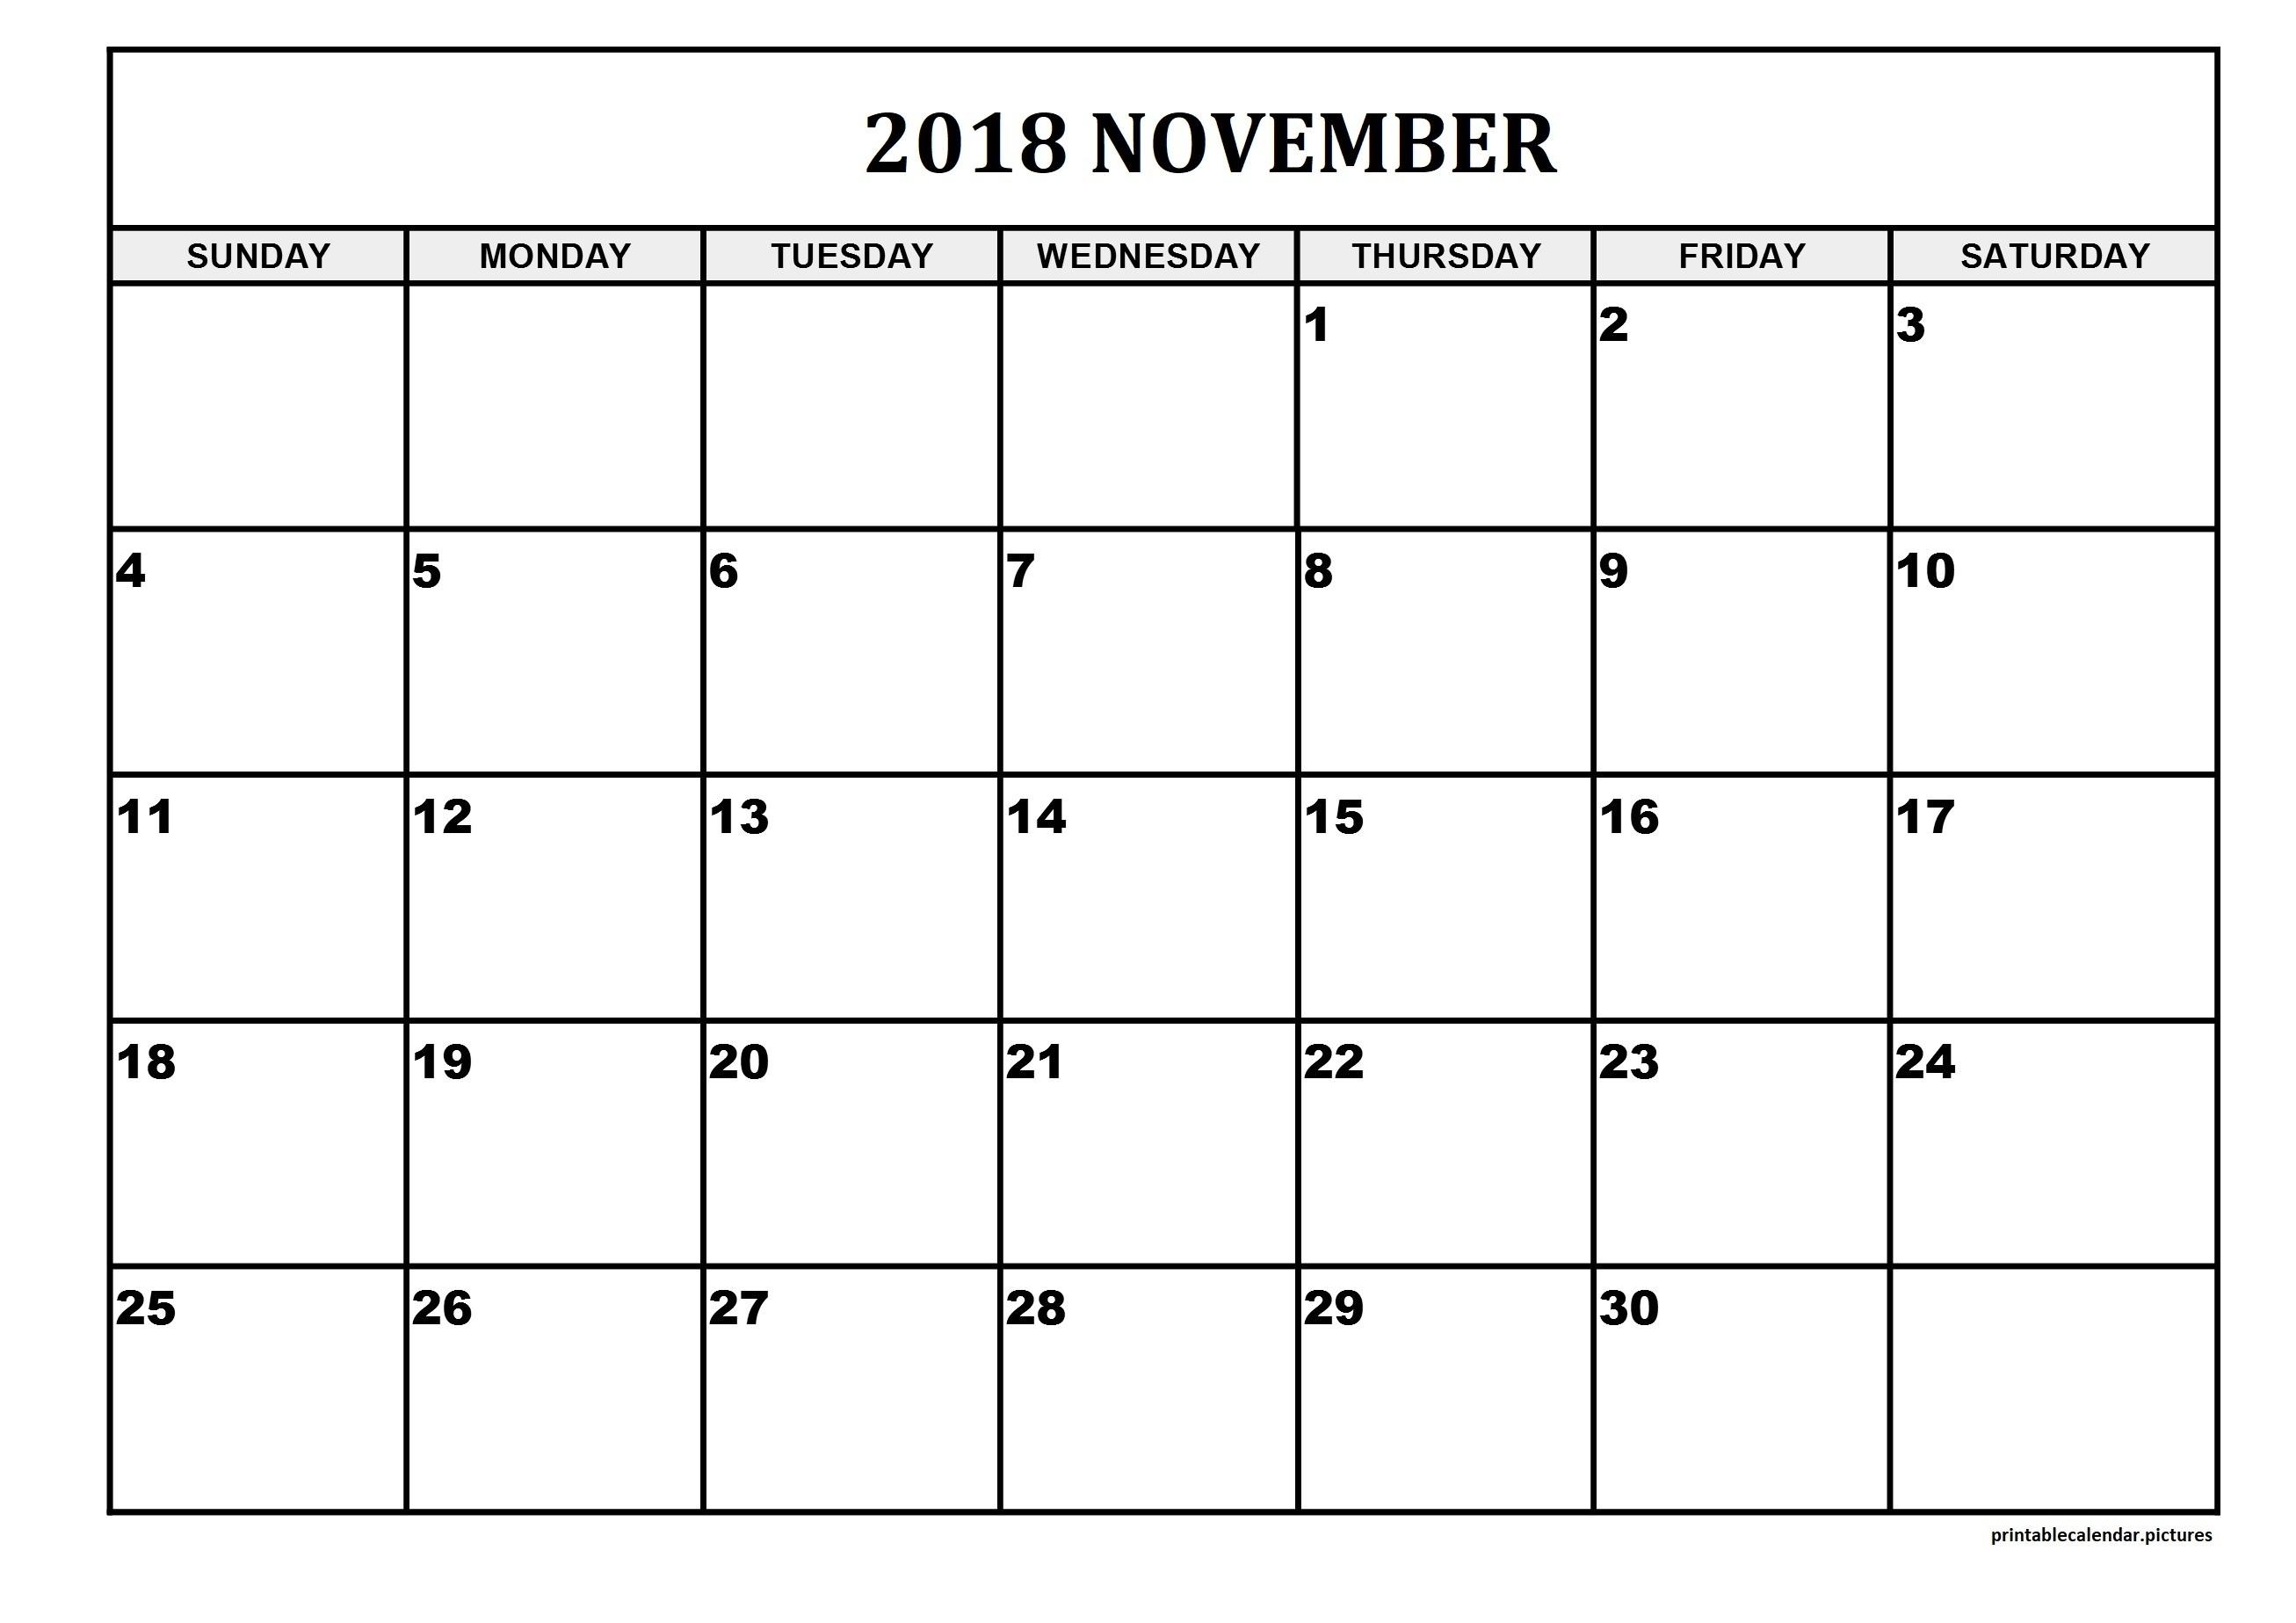 Printable Calendar Large Squares | Printable Calendar 2019-Blank Calandar With Big Squares